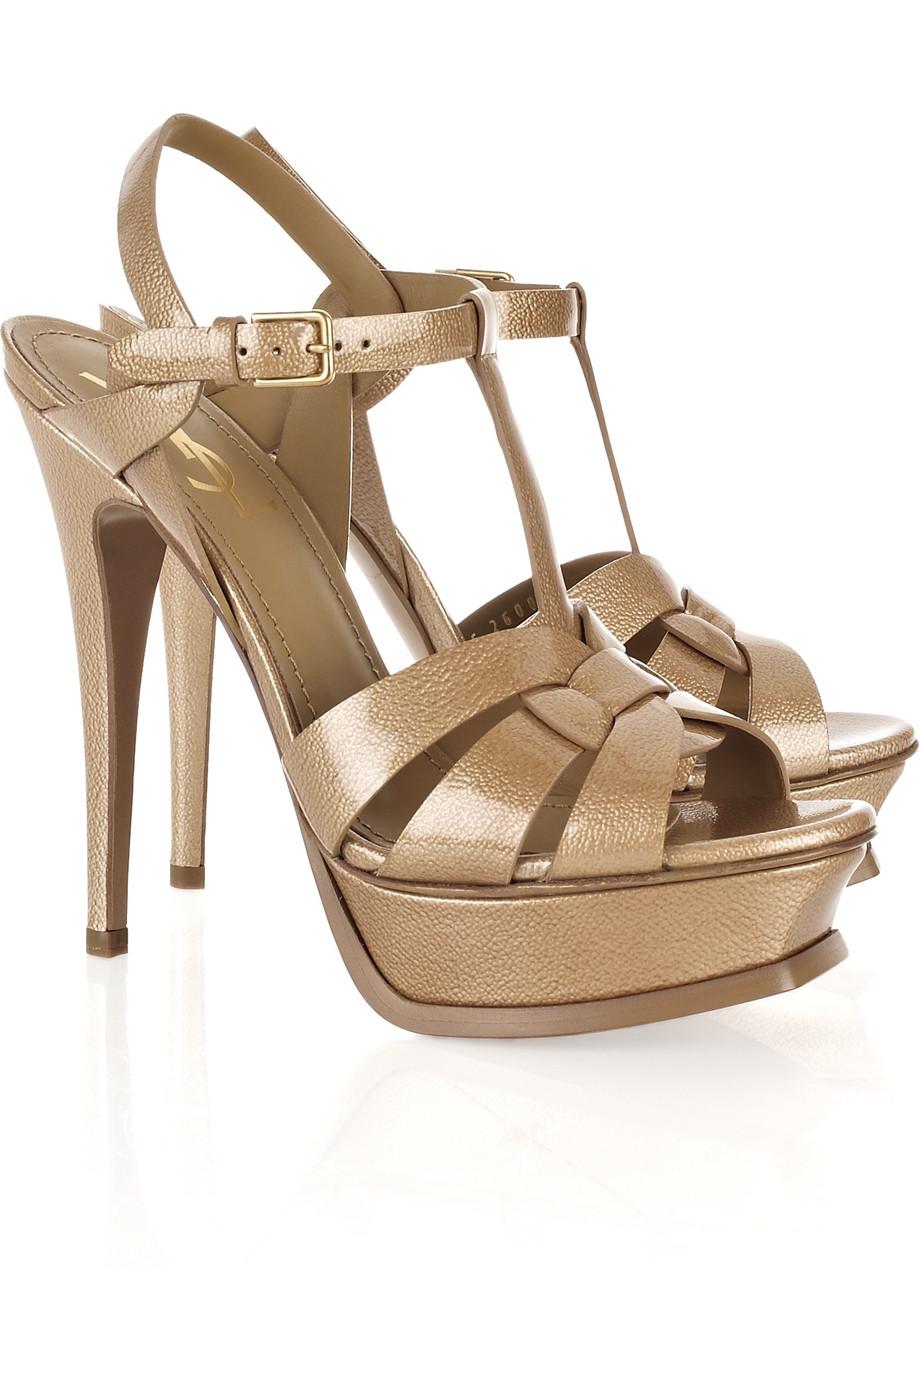 Lyst Saint Laurent Tribute Patent Leather Sandals In Natural